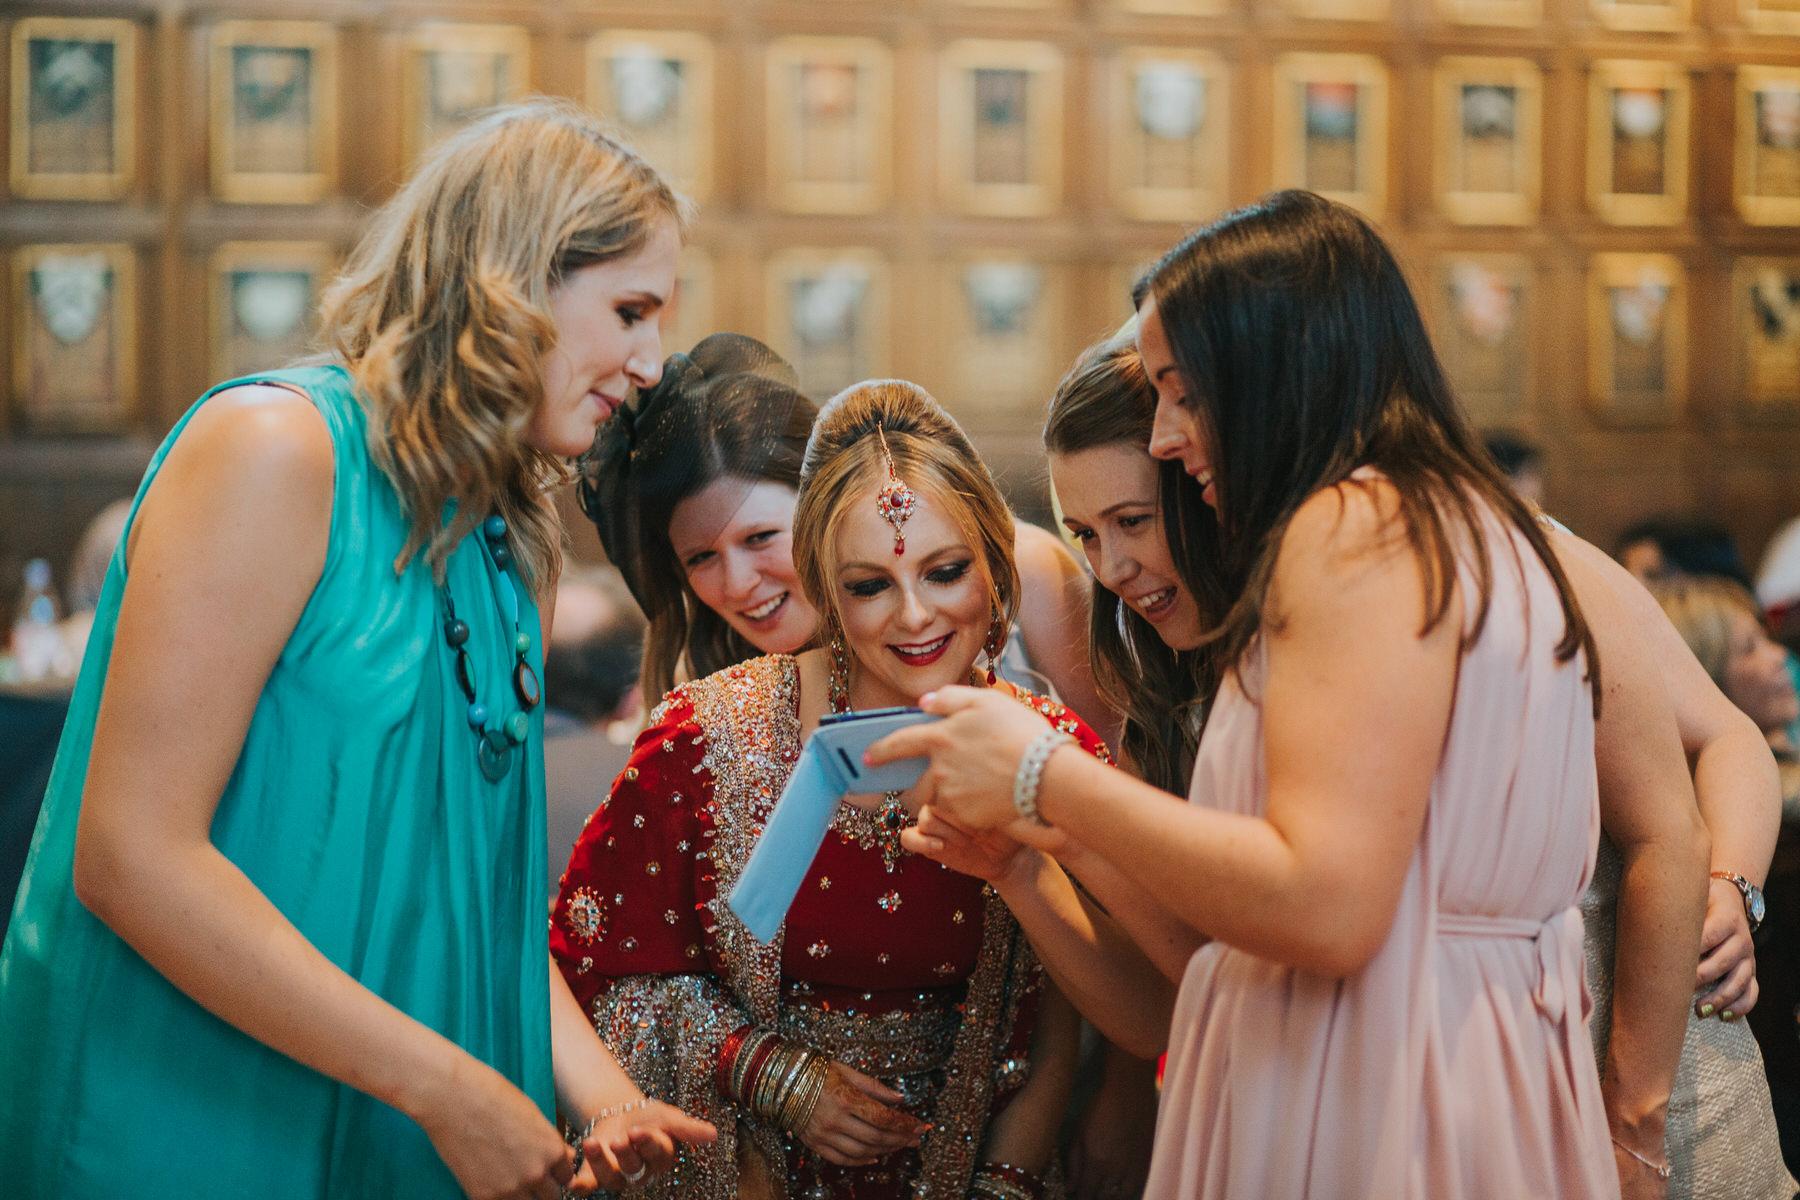 221-bride-red-sari-with-girlfriends.jpg